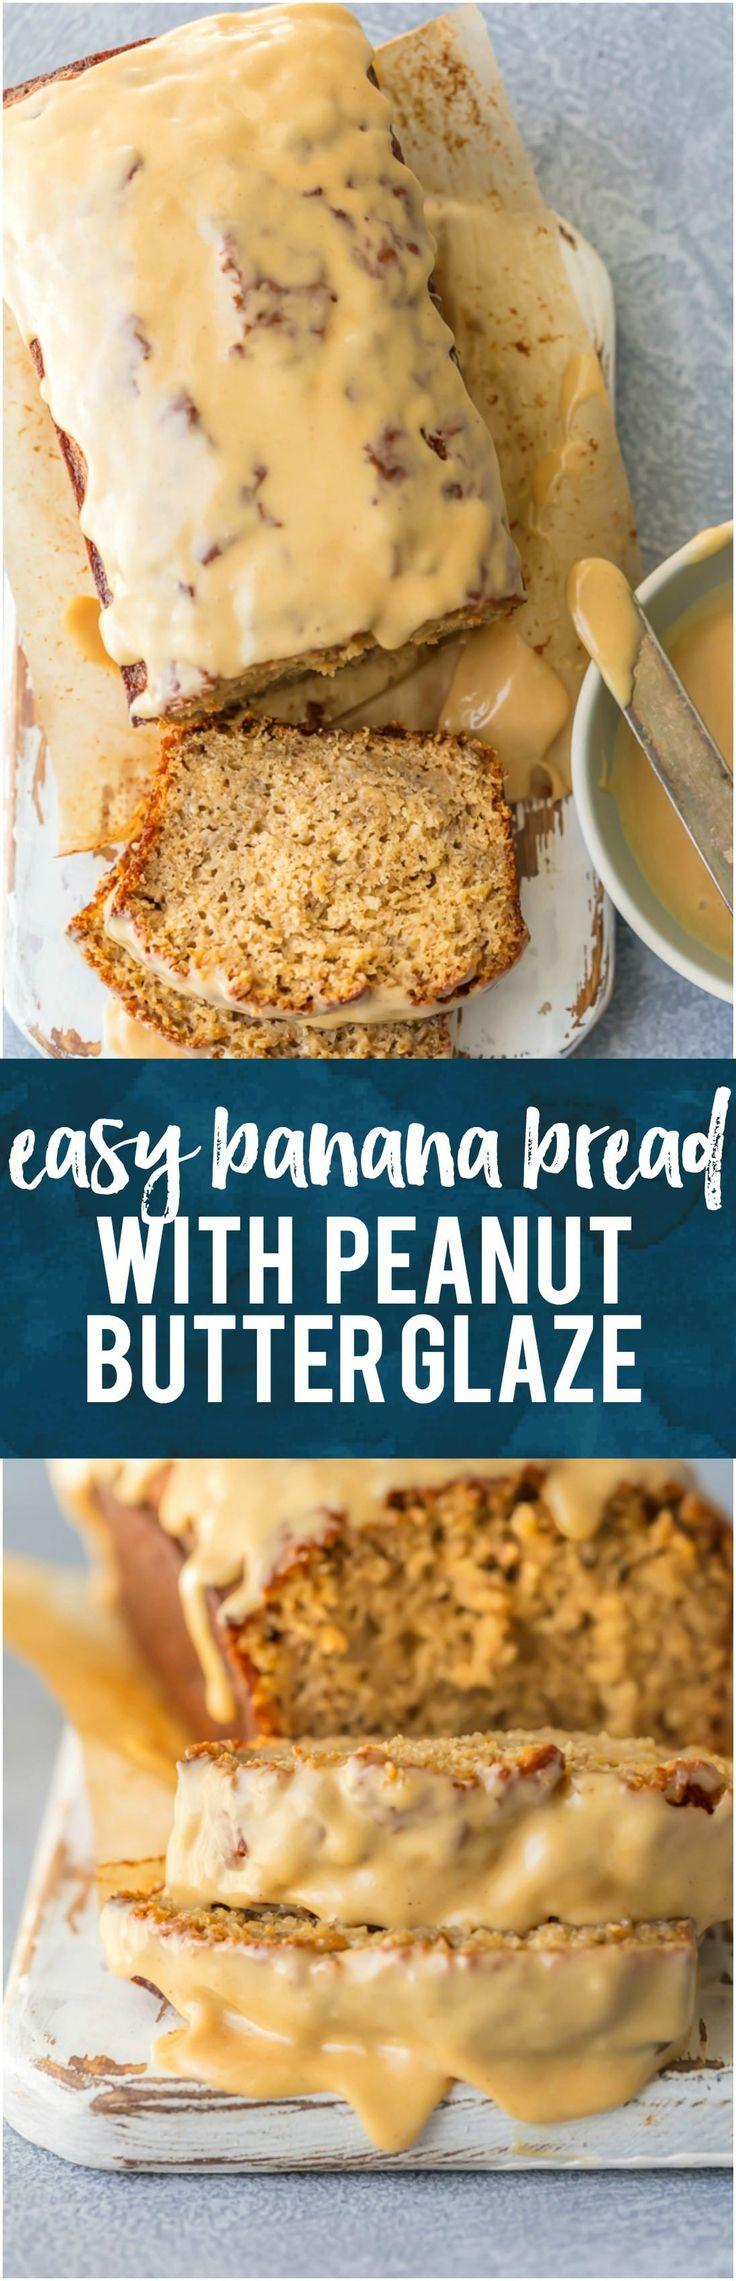 Easy Banana Bread with Peanut Butter Glaze